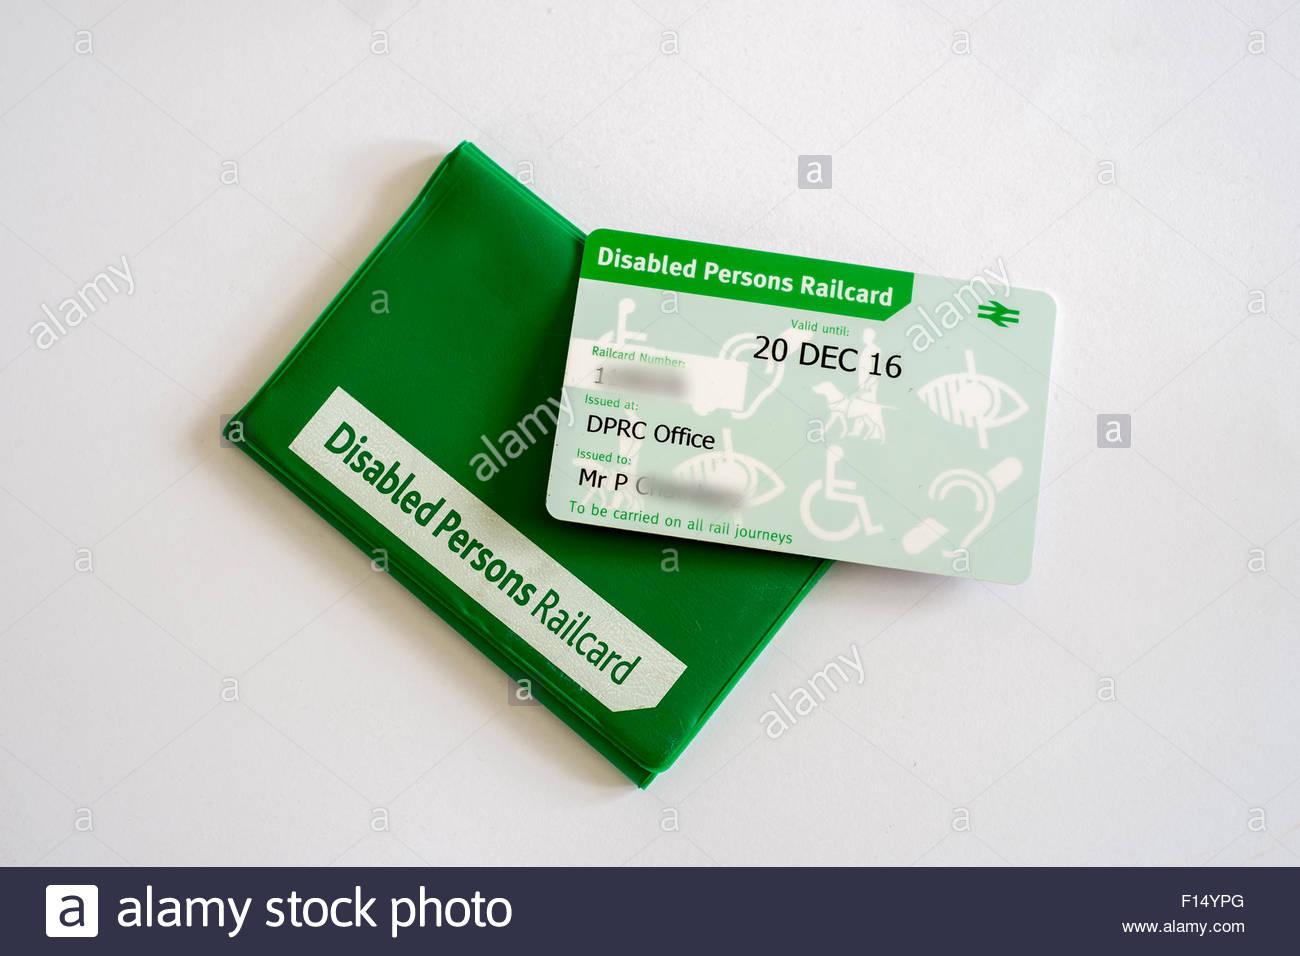 None Railcard Railcard Annual Gold Card Cambrian Railcard Cotswold Line Railcard Dales Railcard Devon & Cornwall Railcard Disabled Child Railcard Disabled Persons Railcard Esk Valley Railcard Family & Friends Railcard GroupSave Discount Heart of Wales Railcard Highland Railcard: North Scotland Highland Railcard: West Scotland HM Forces Railcard Jobcentre Plus .